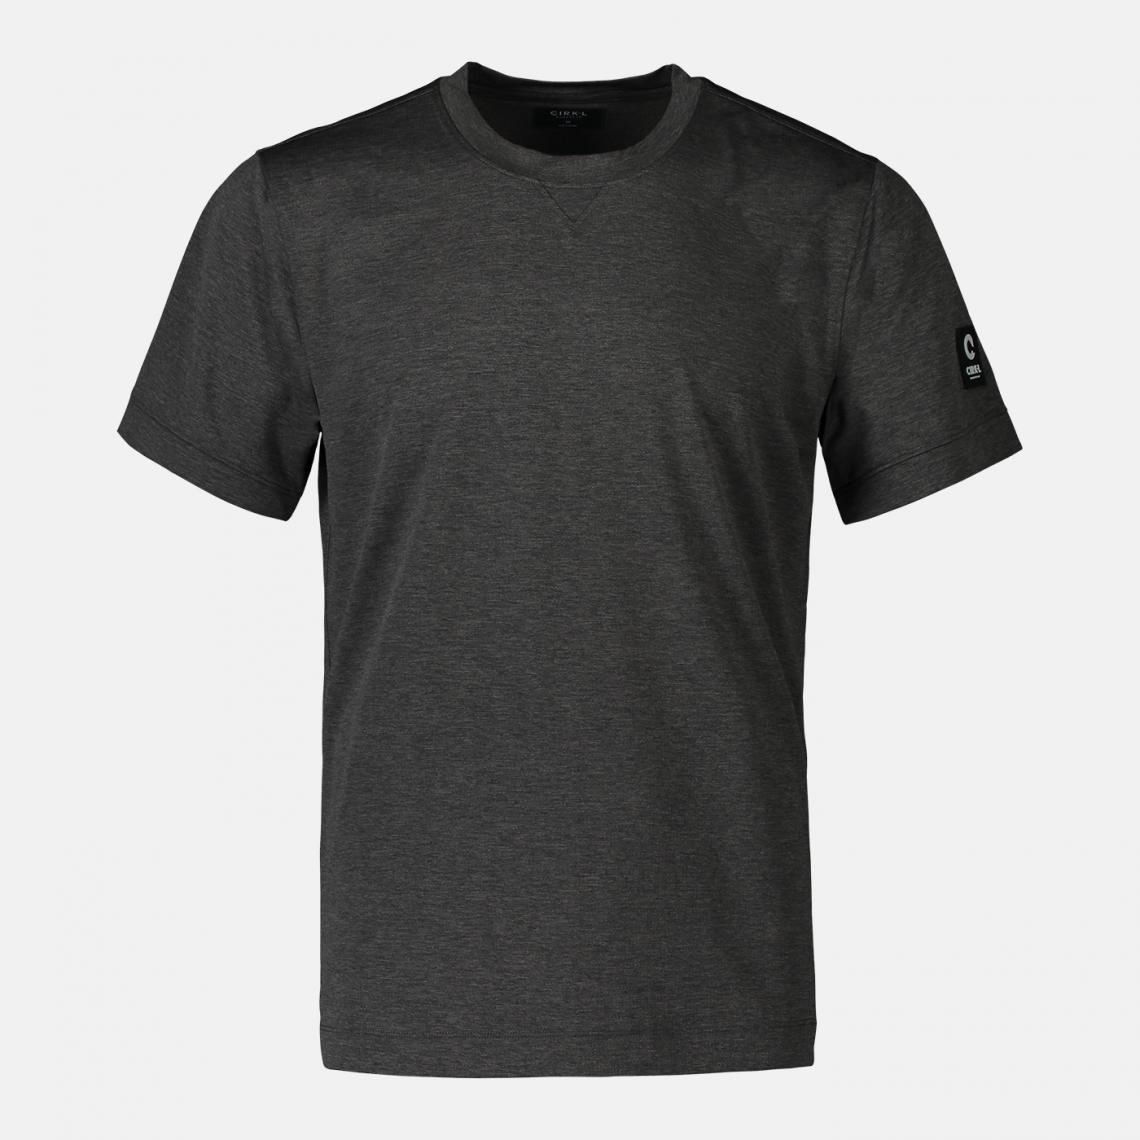 T-shirt grå i återvunnen polyester